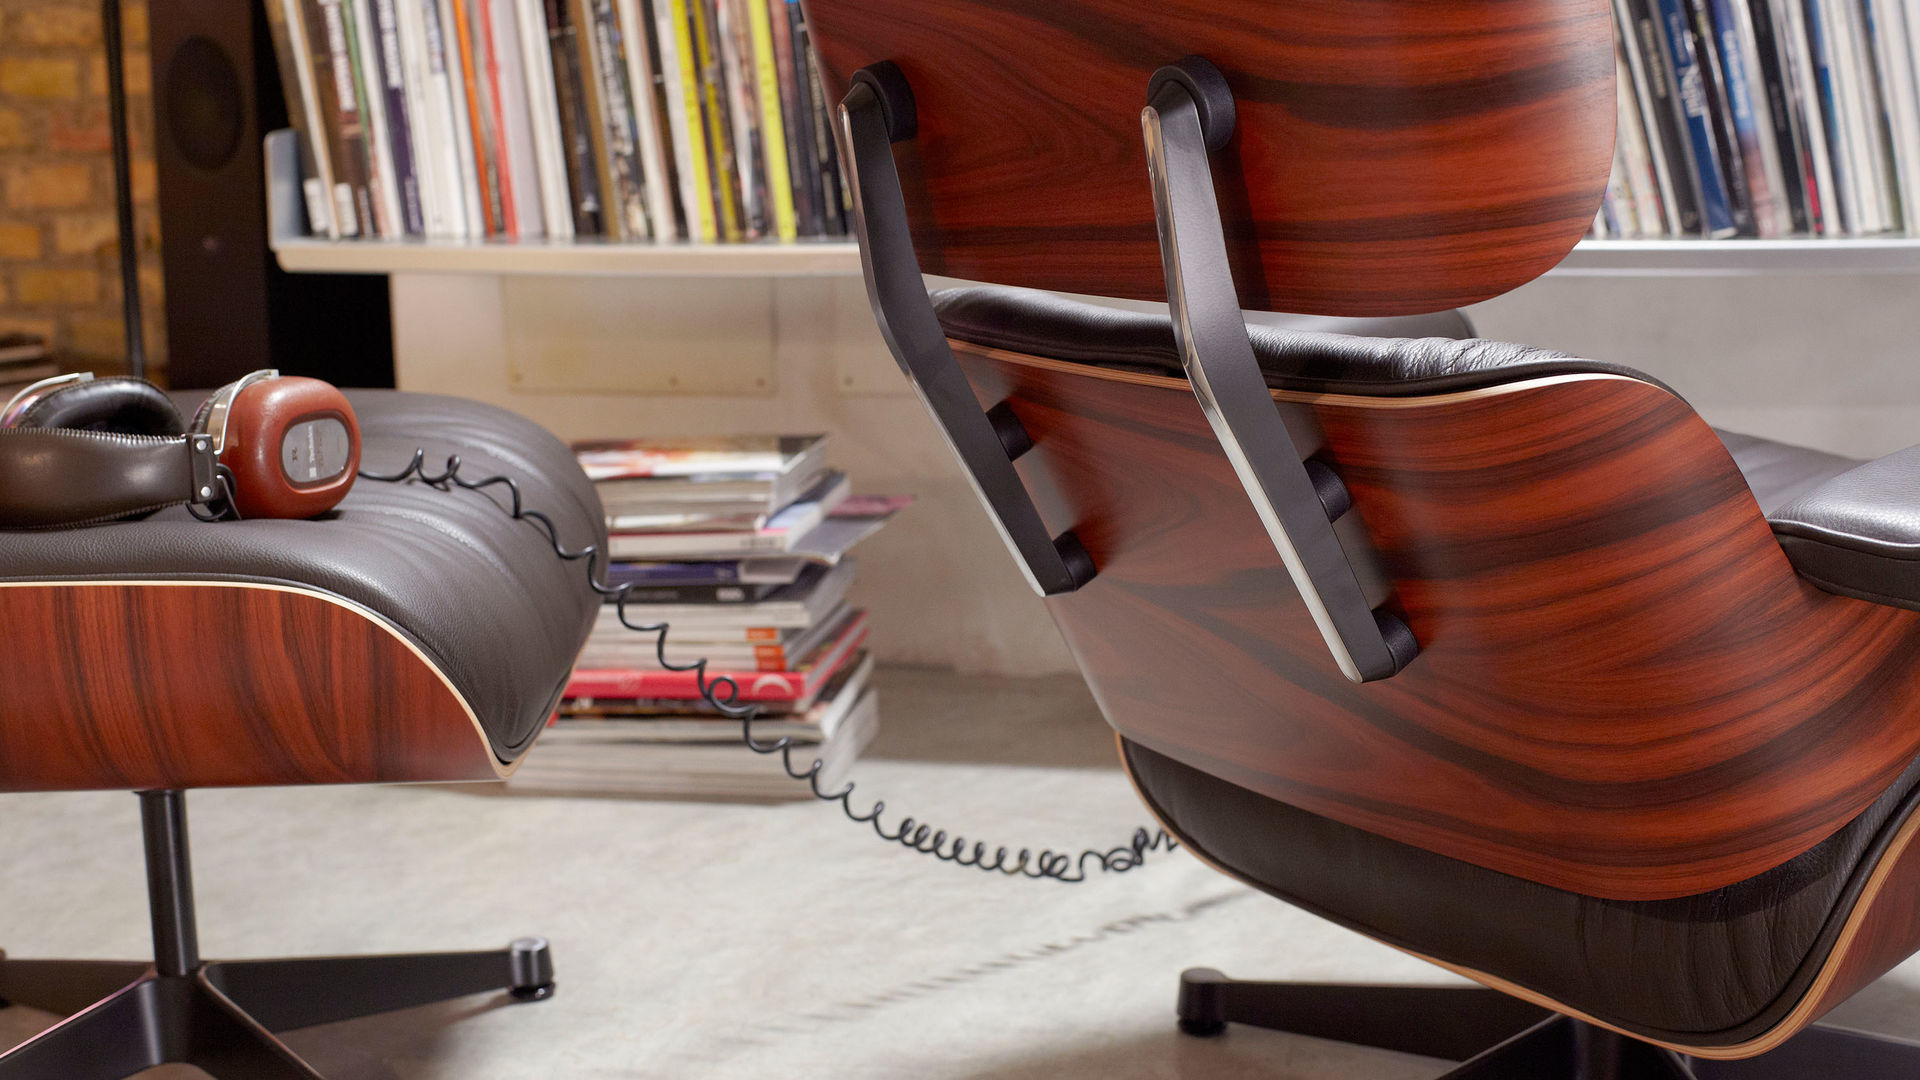 Eames Vitra Lounge Chair vitra lounge chair